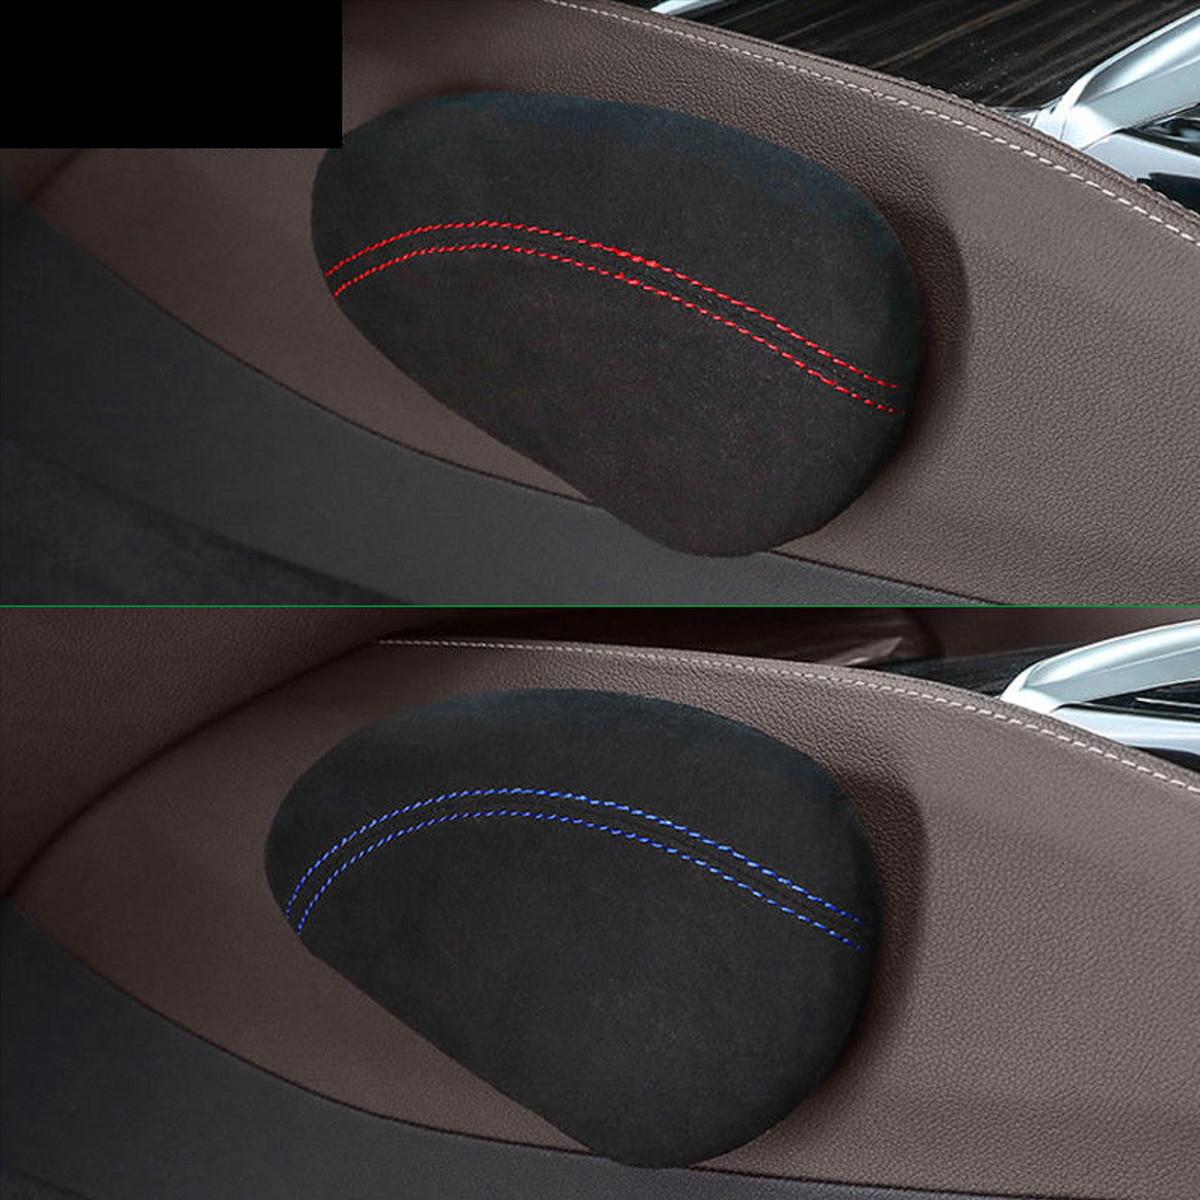 Leather Car Knee Pad Leg Cushion Thigh Support Pillow Interior for BMW X5 X6 E52 E53 E60 E90